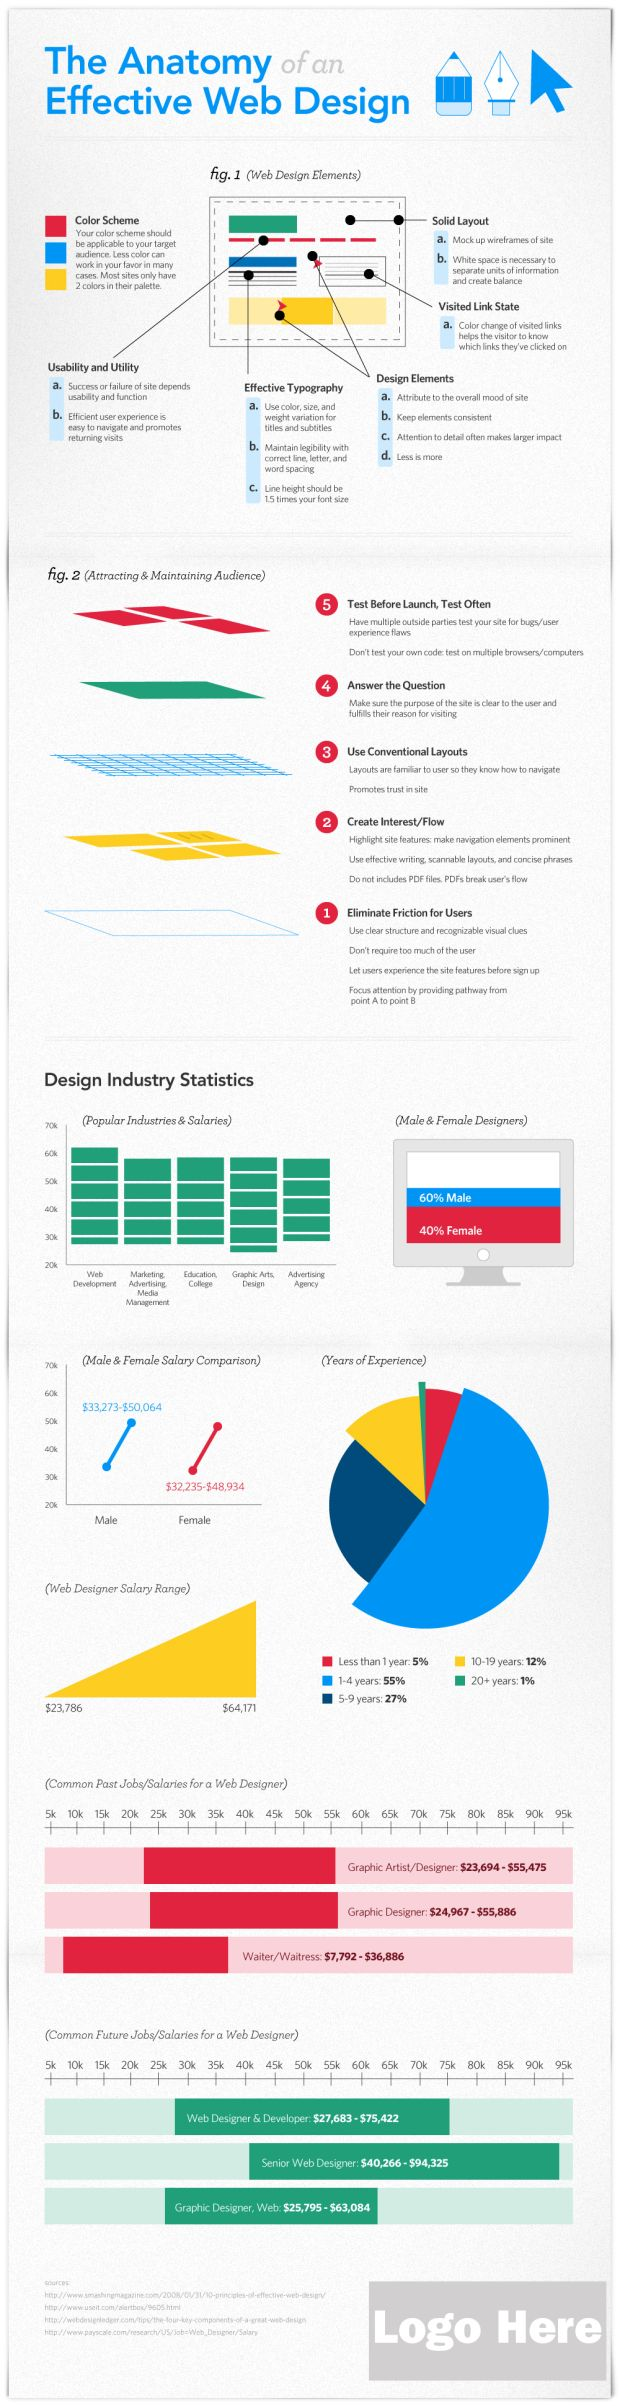 The Anatomy of Effective Web Design   Infographic - UltraLinx